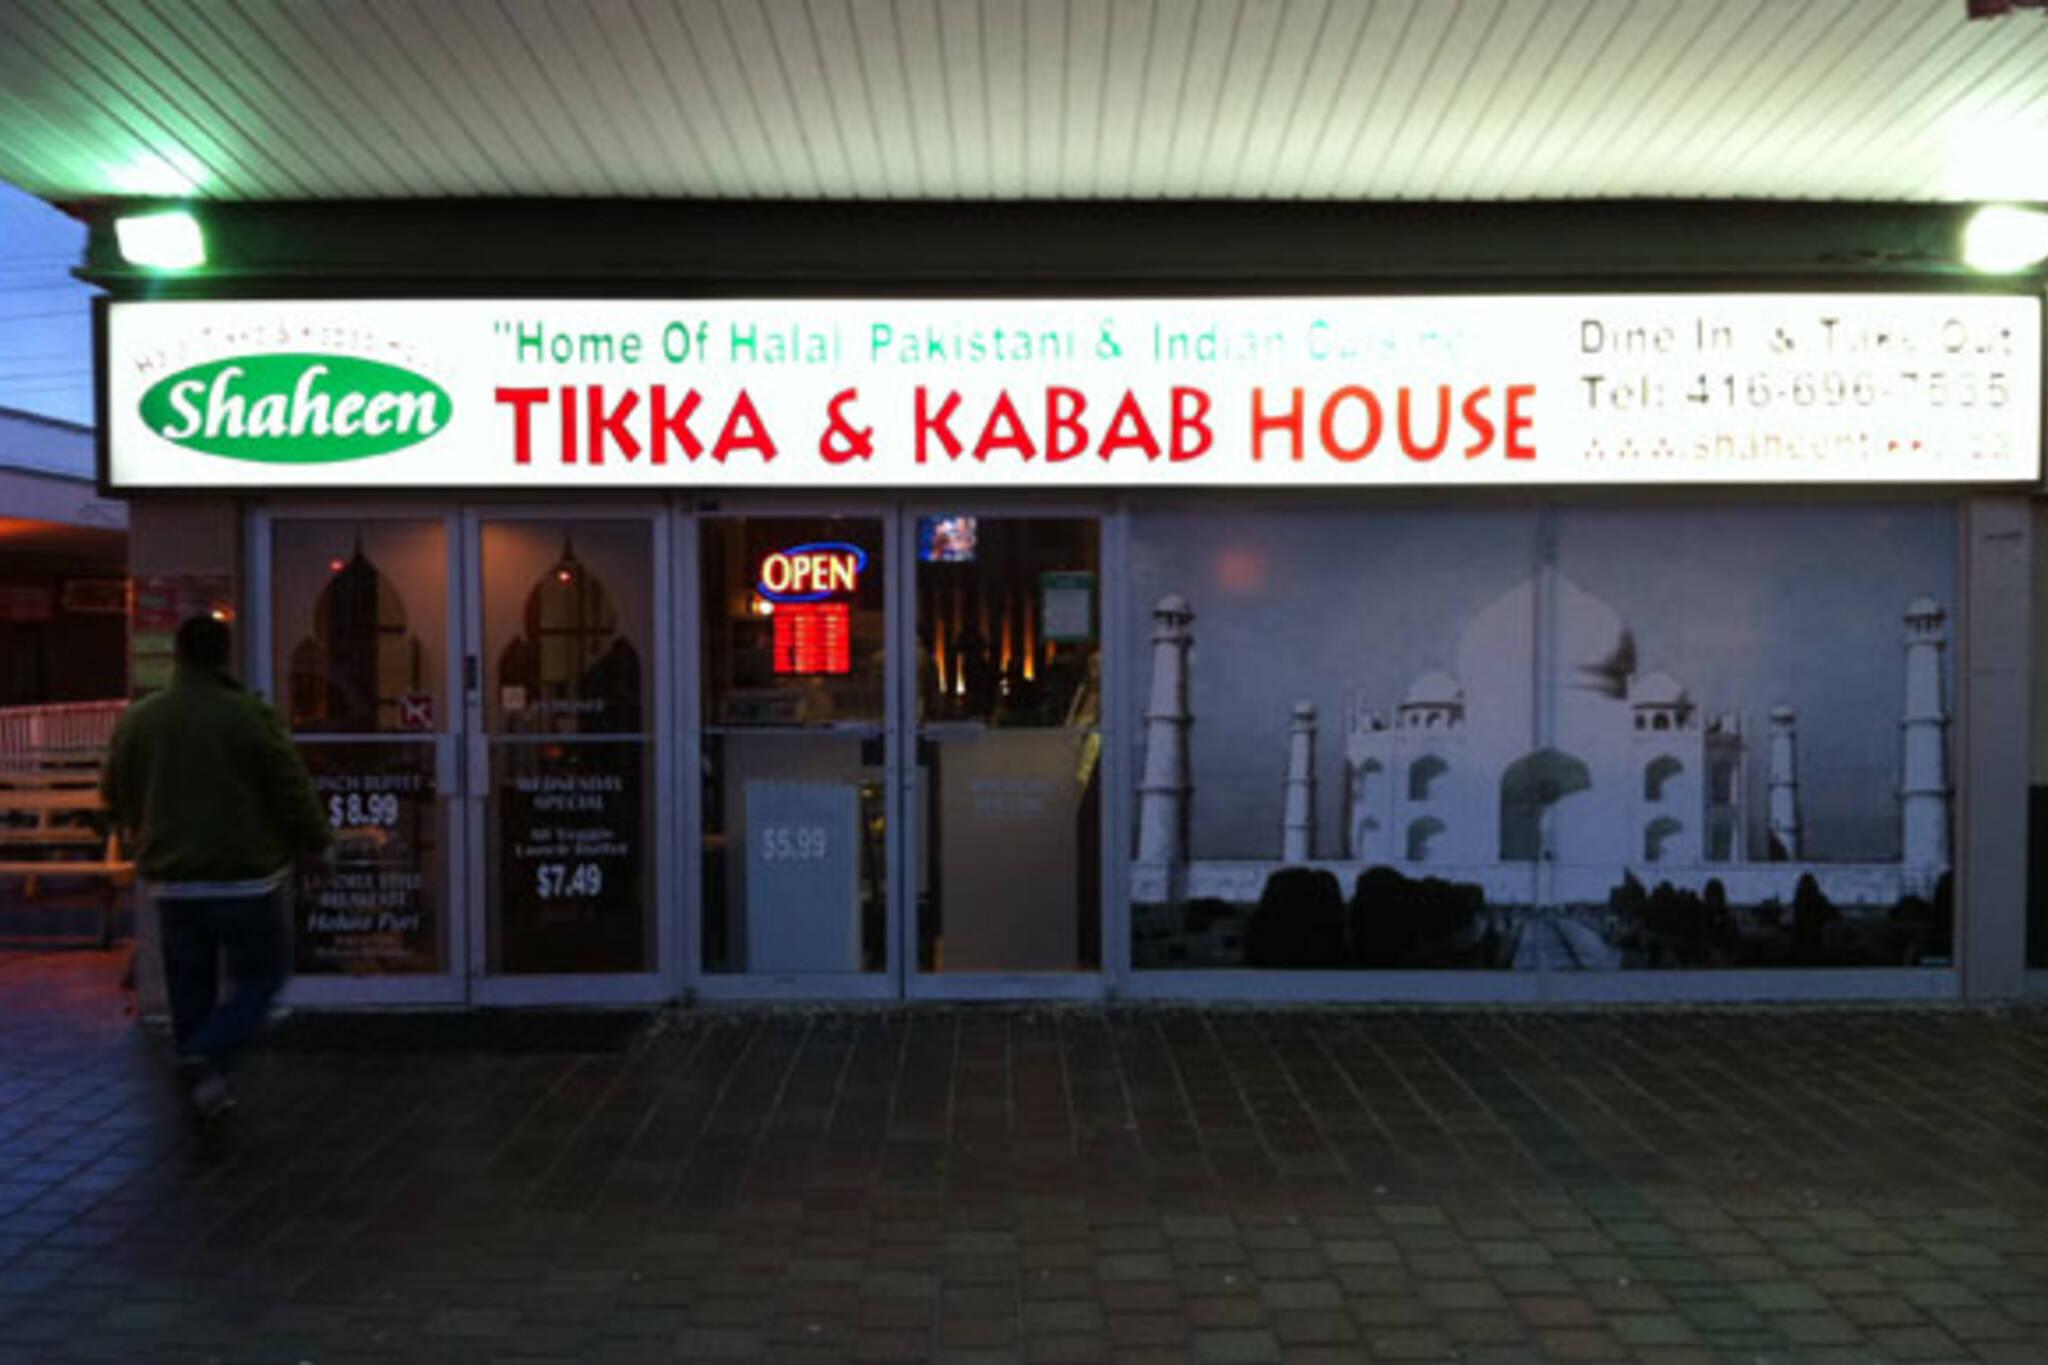 Shaheen Tikka & Kabab House